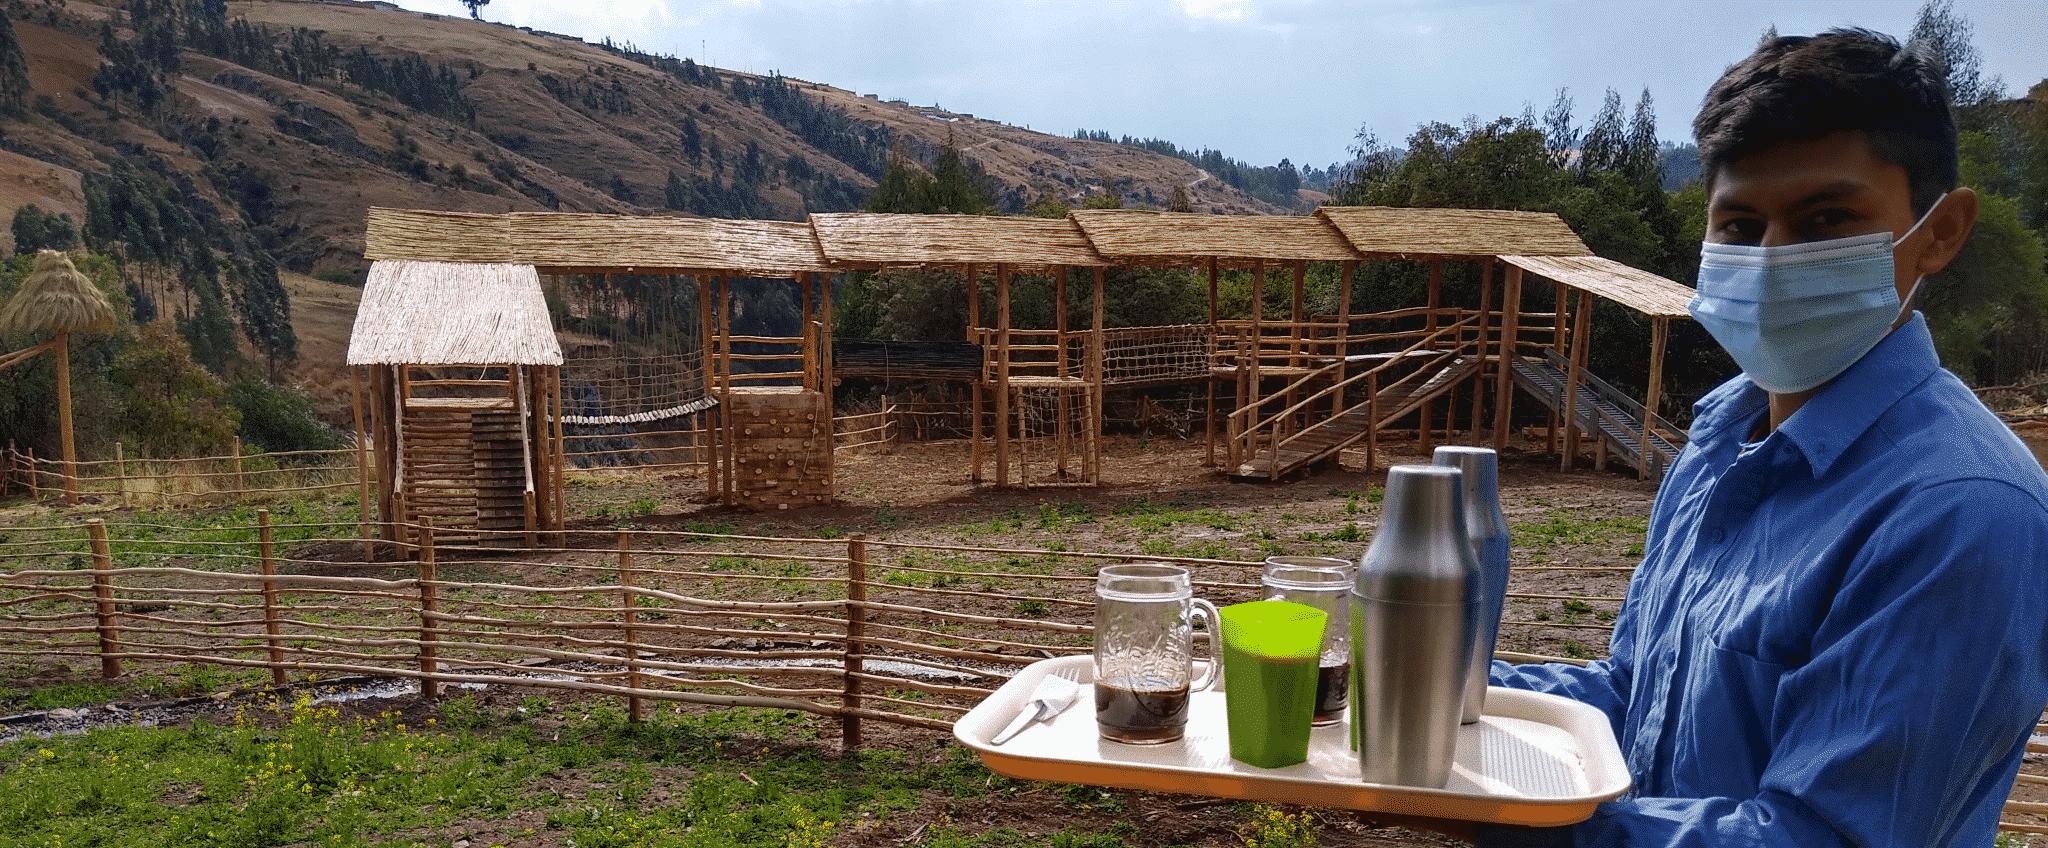 Eco Park location